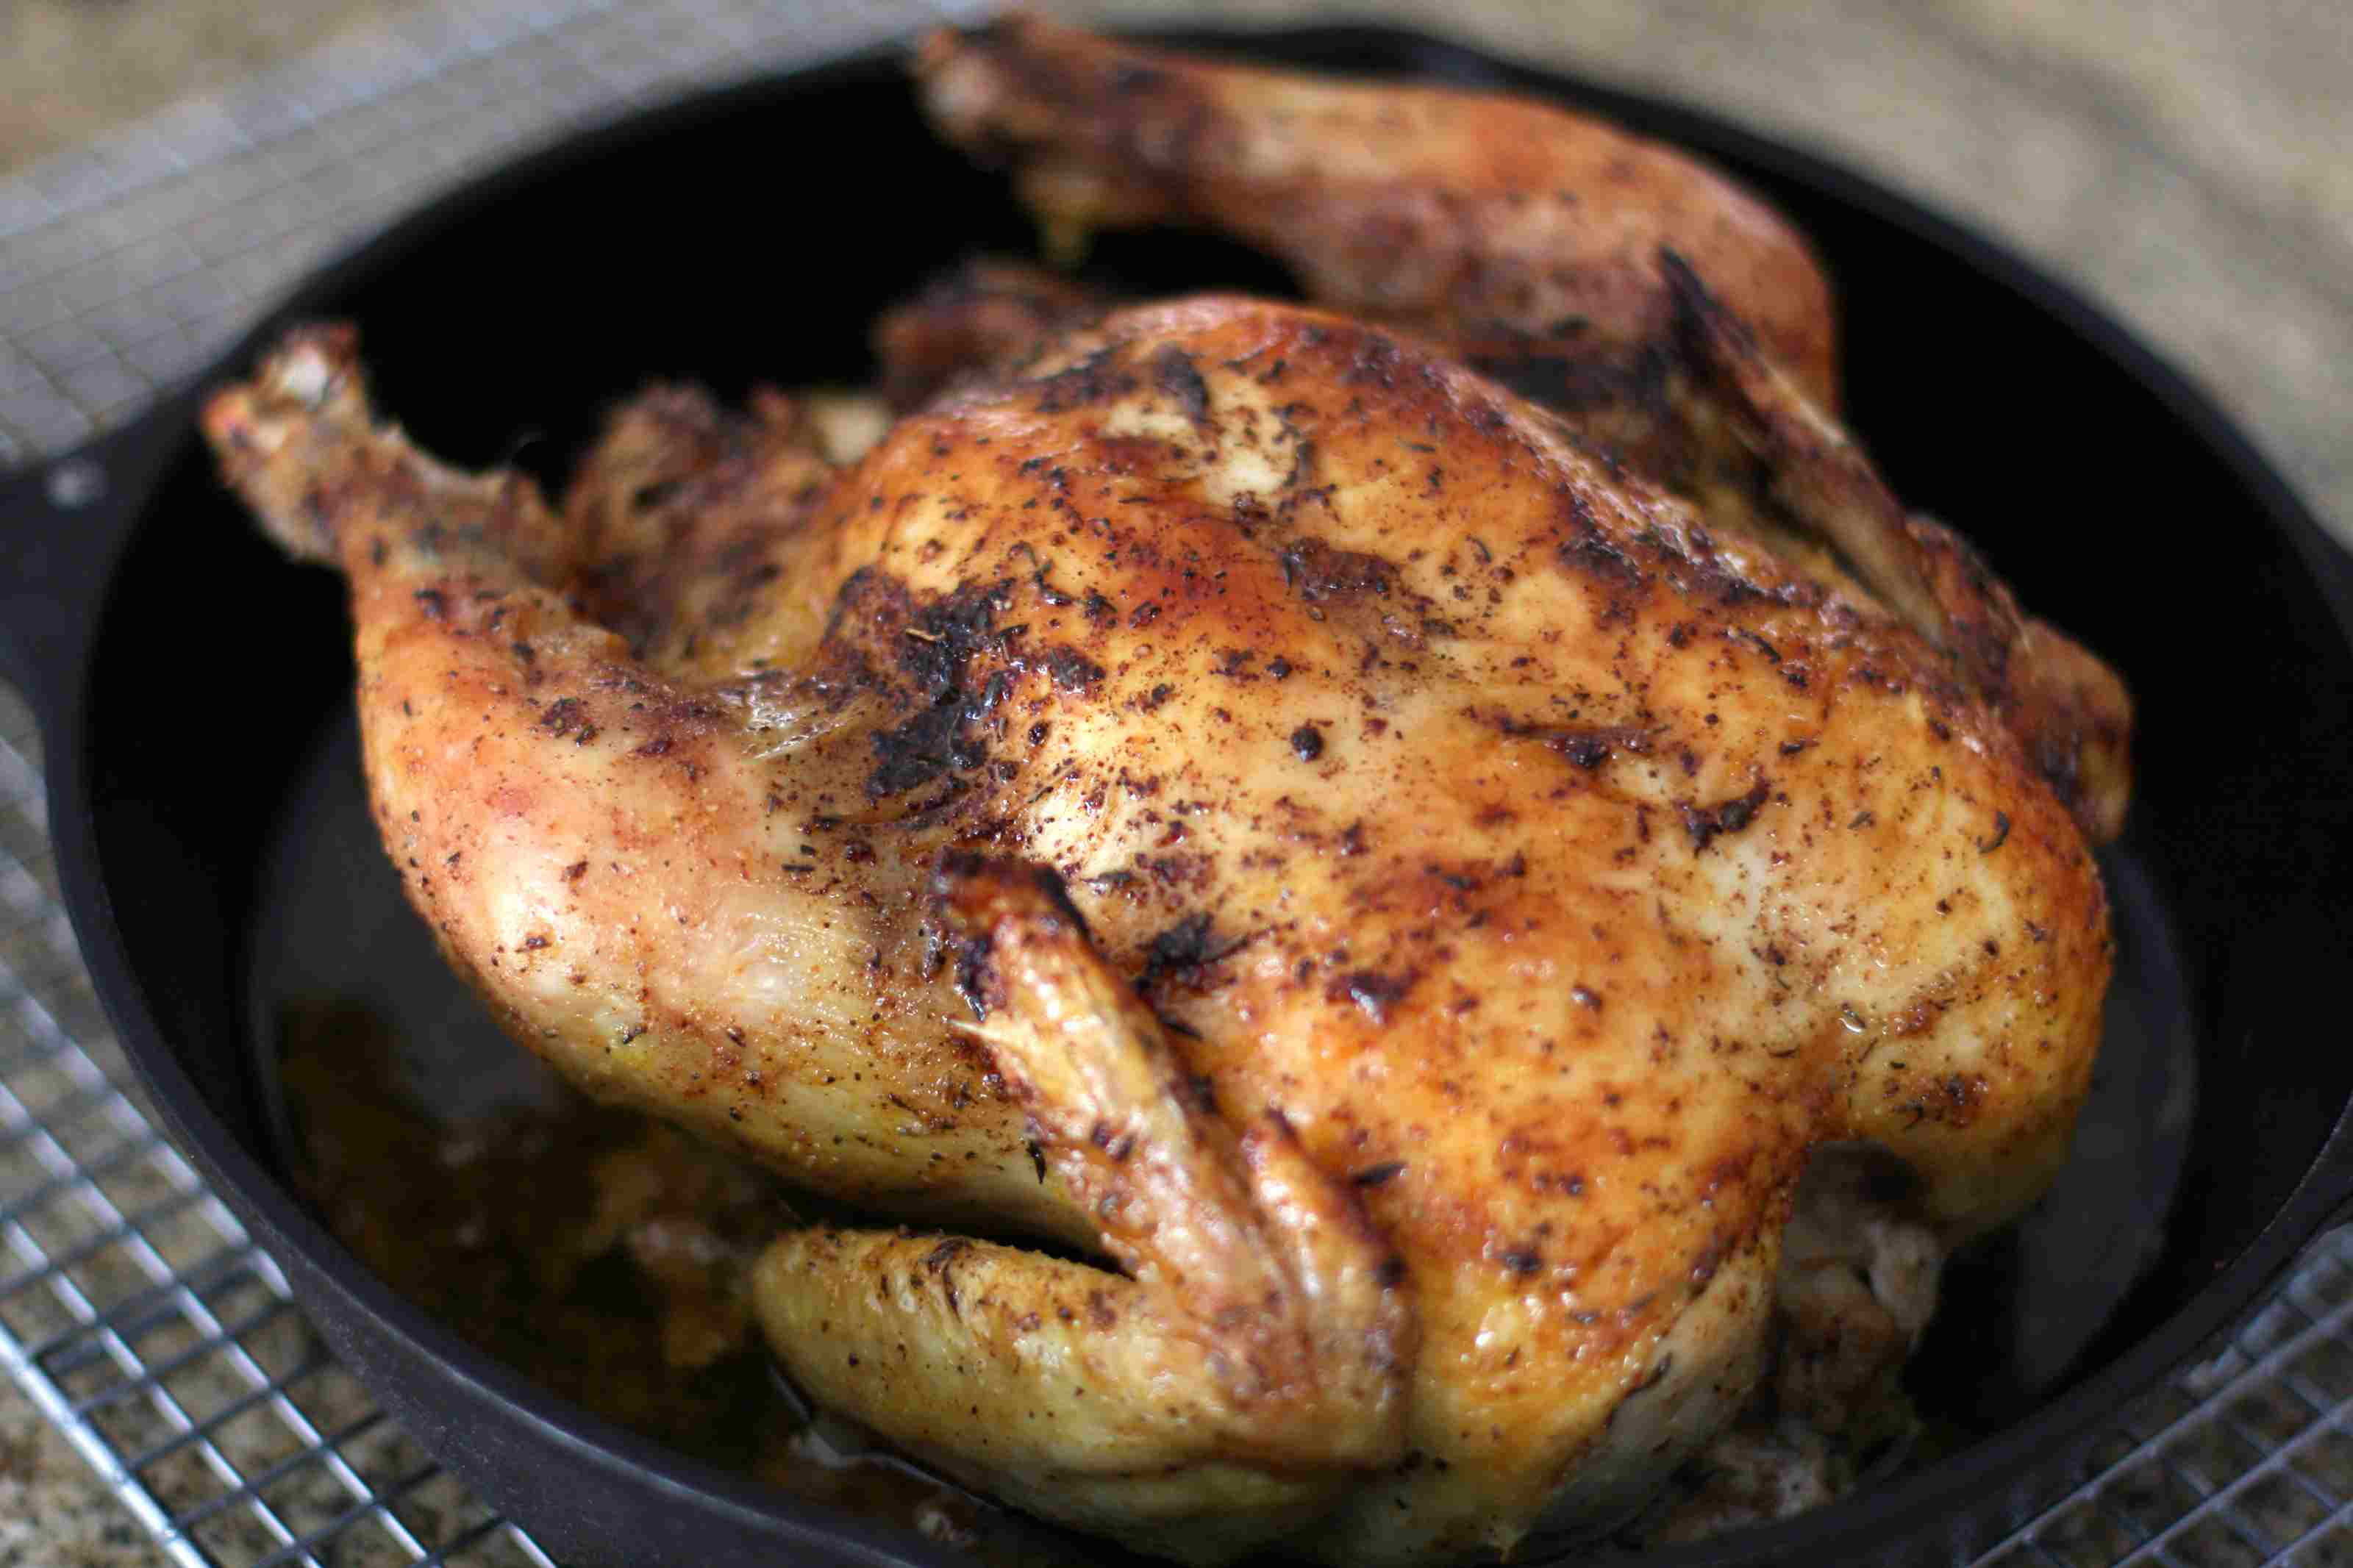 Roast chicken with herbs.